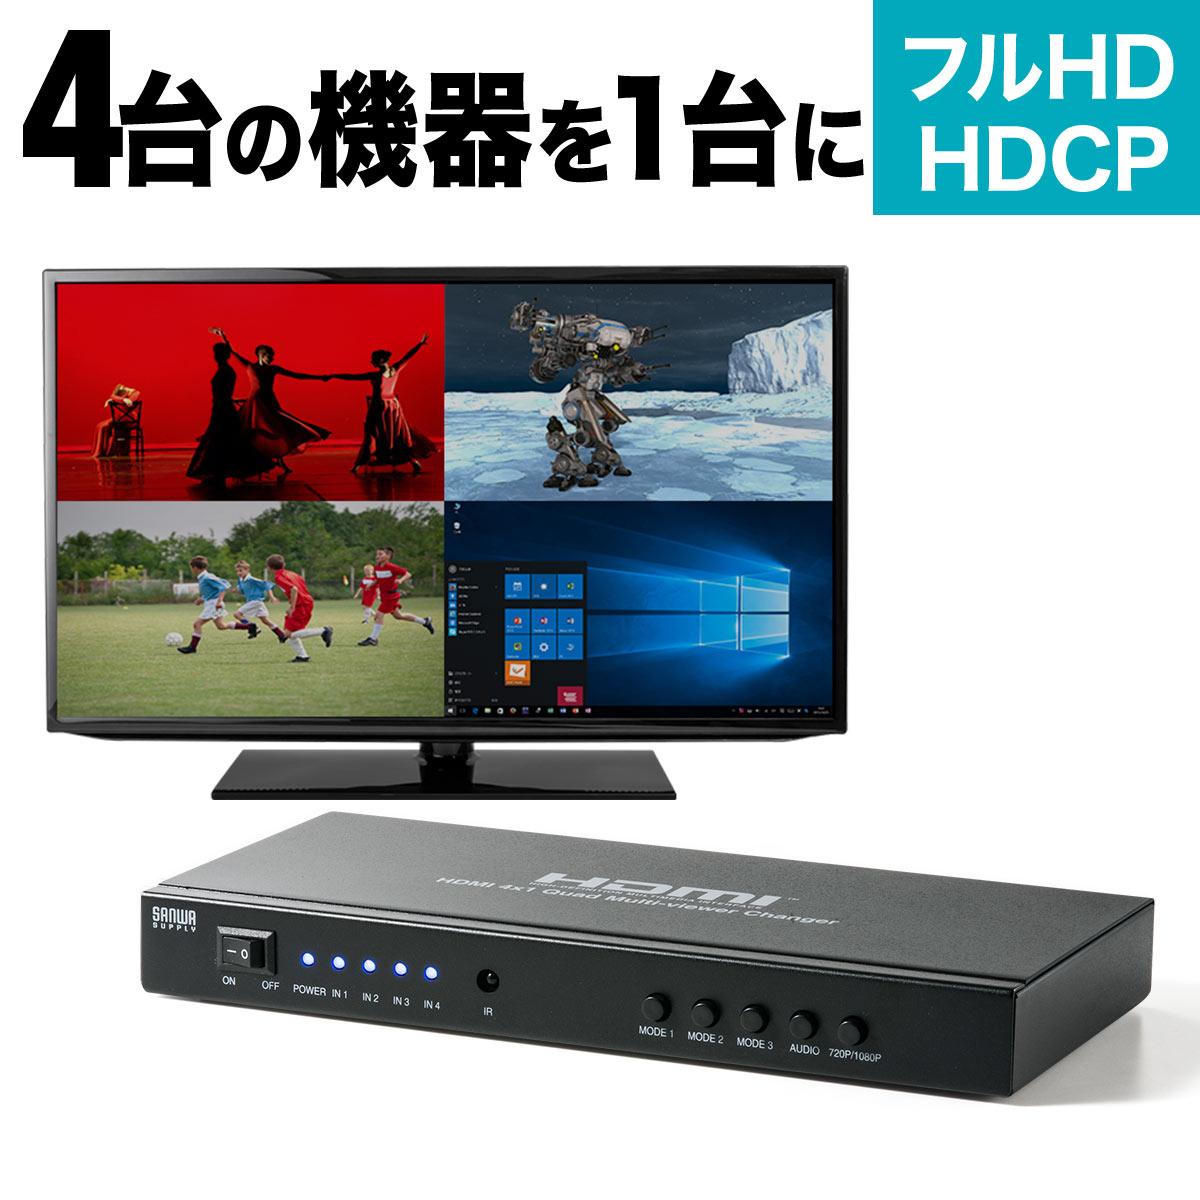 HDMI画面分割切替器 4画面分割 マルチビューワー フルHD対応 4入力・1出力 オートスキャン機能搭載 リモコン ACアダプタ付属 切替機 HDMI セレクター 切り替え [400-SW030]【サンワダイレクト限定品】【送料無料】